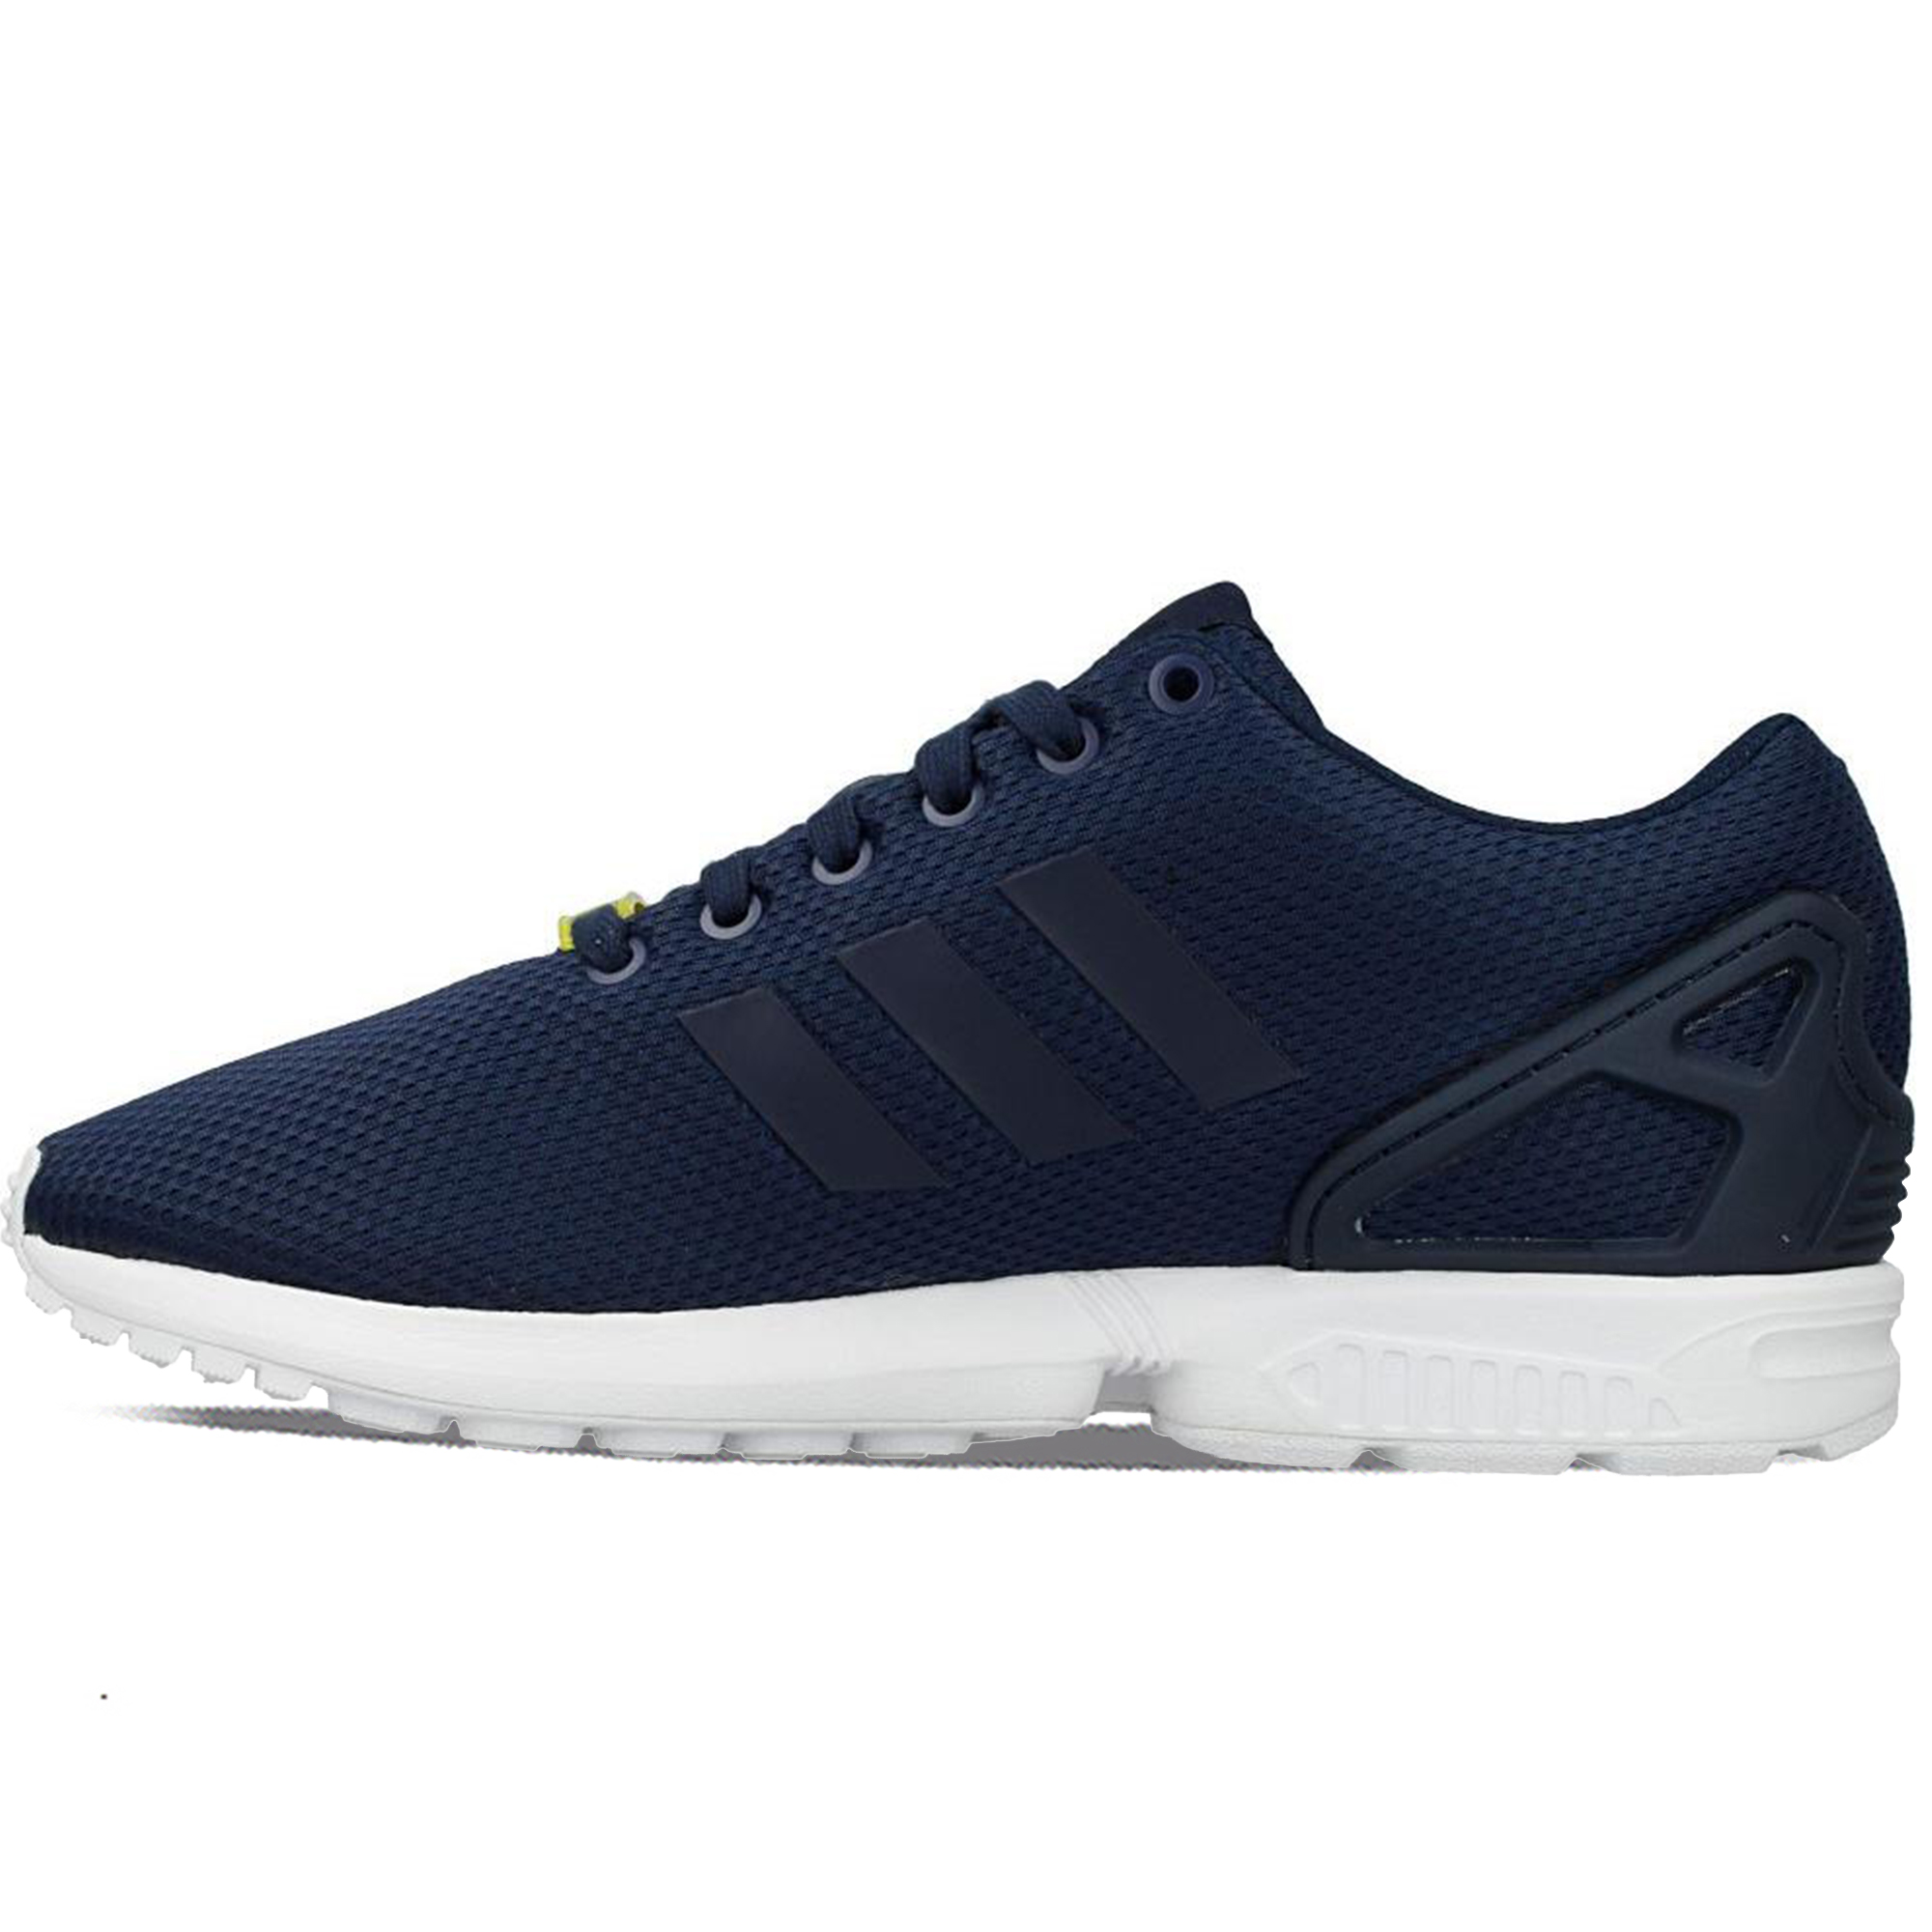 Adidas Adidas Nuova Scarpe Nuova Scarpe Adidas Nuova Collezione Collezione Scarpe Collezione xohtrdsQCB